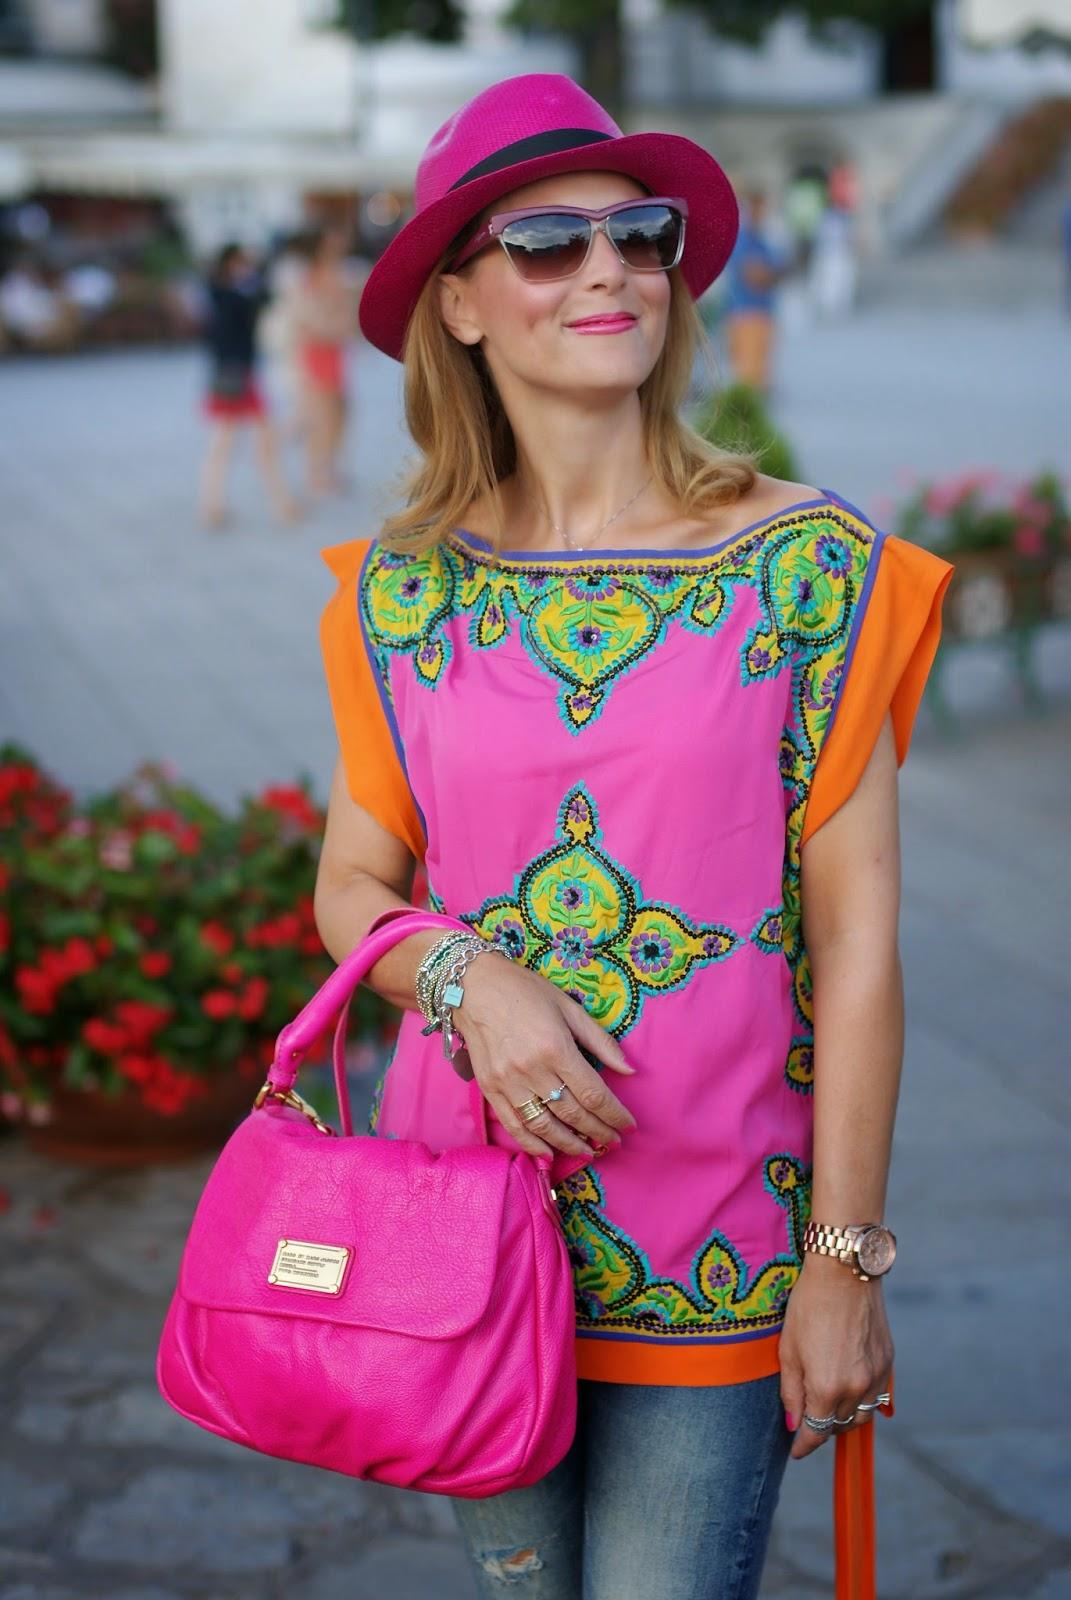 Preeti S Kapoor top, Little Ukita bag, Ecua-Andino hat, Fashion and Cookies, fashion blogger